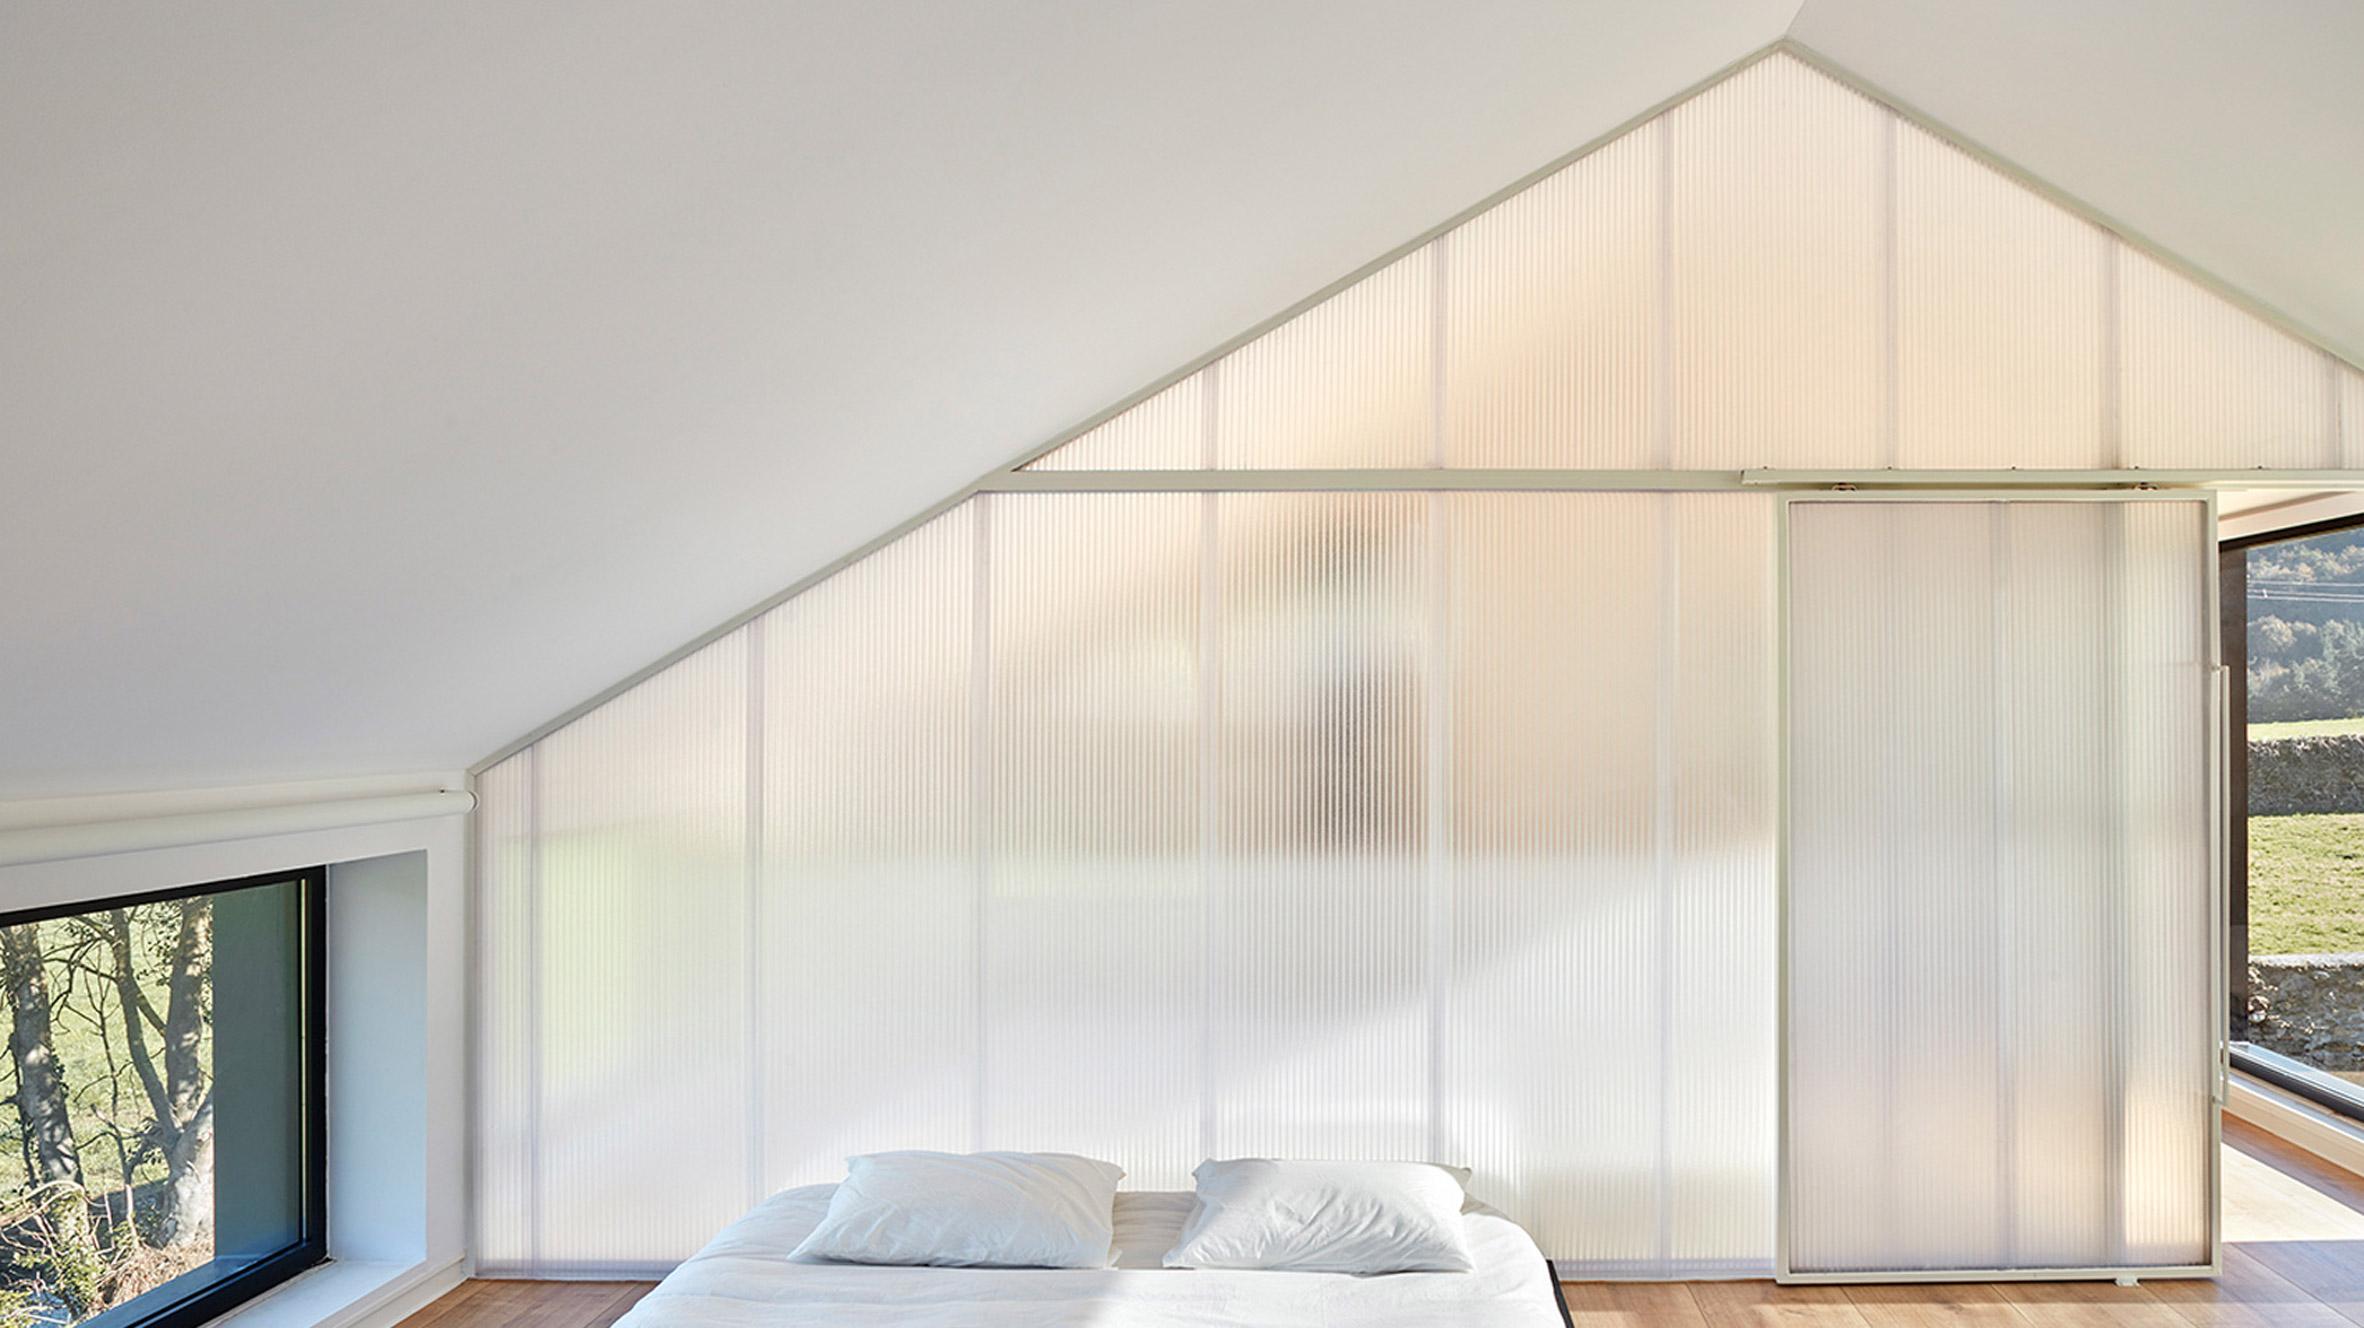 Casa Montaña, Spain, by Baragaño Architects